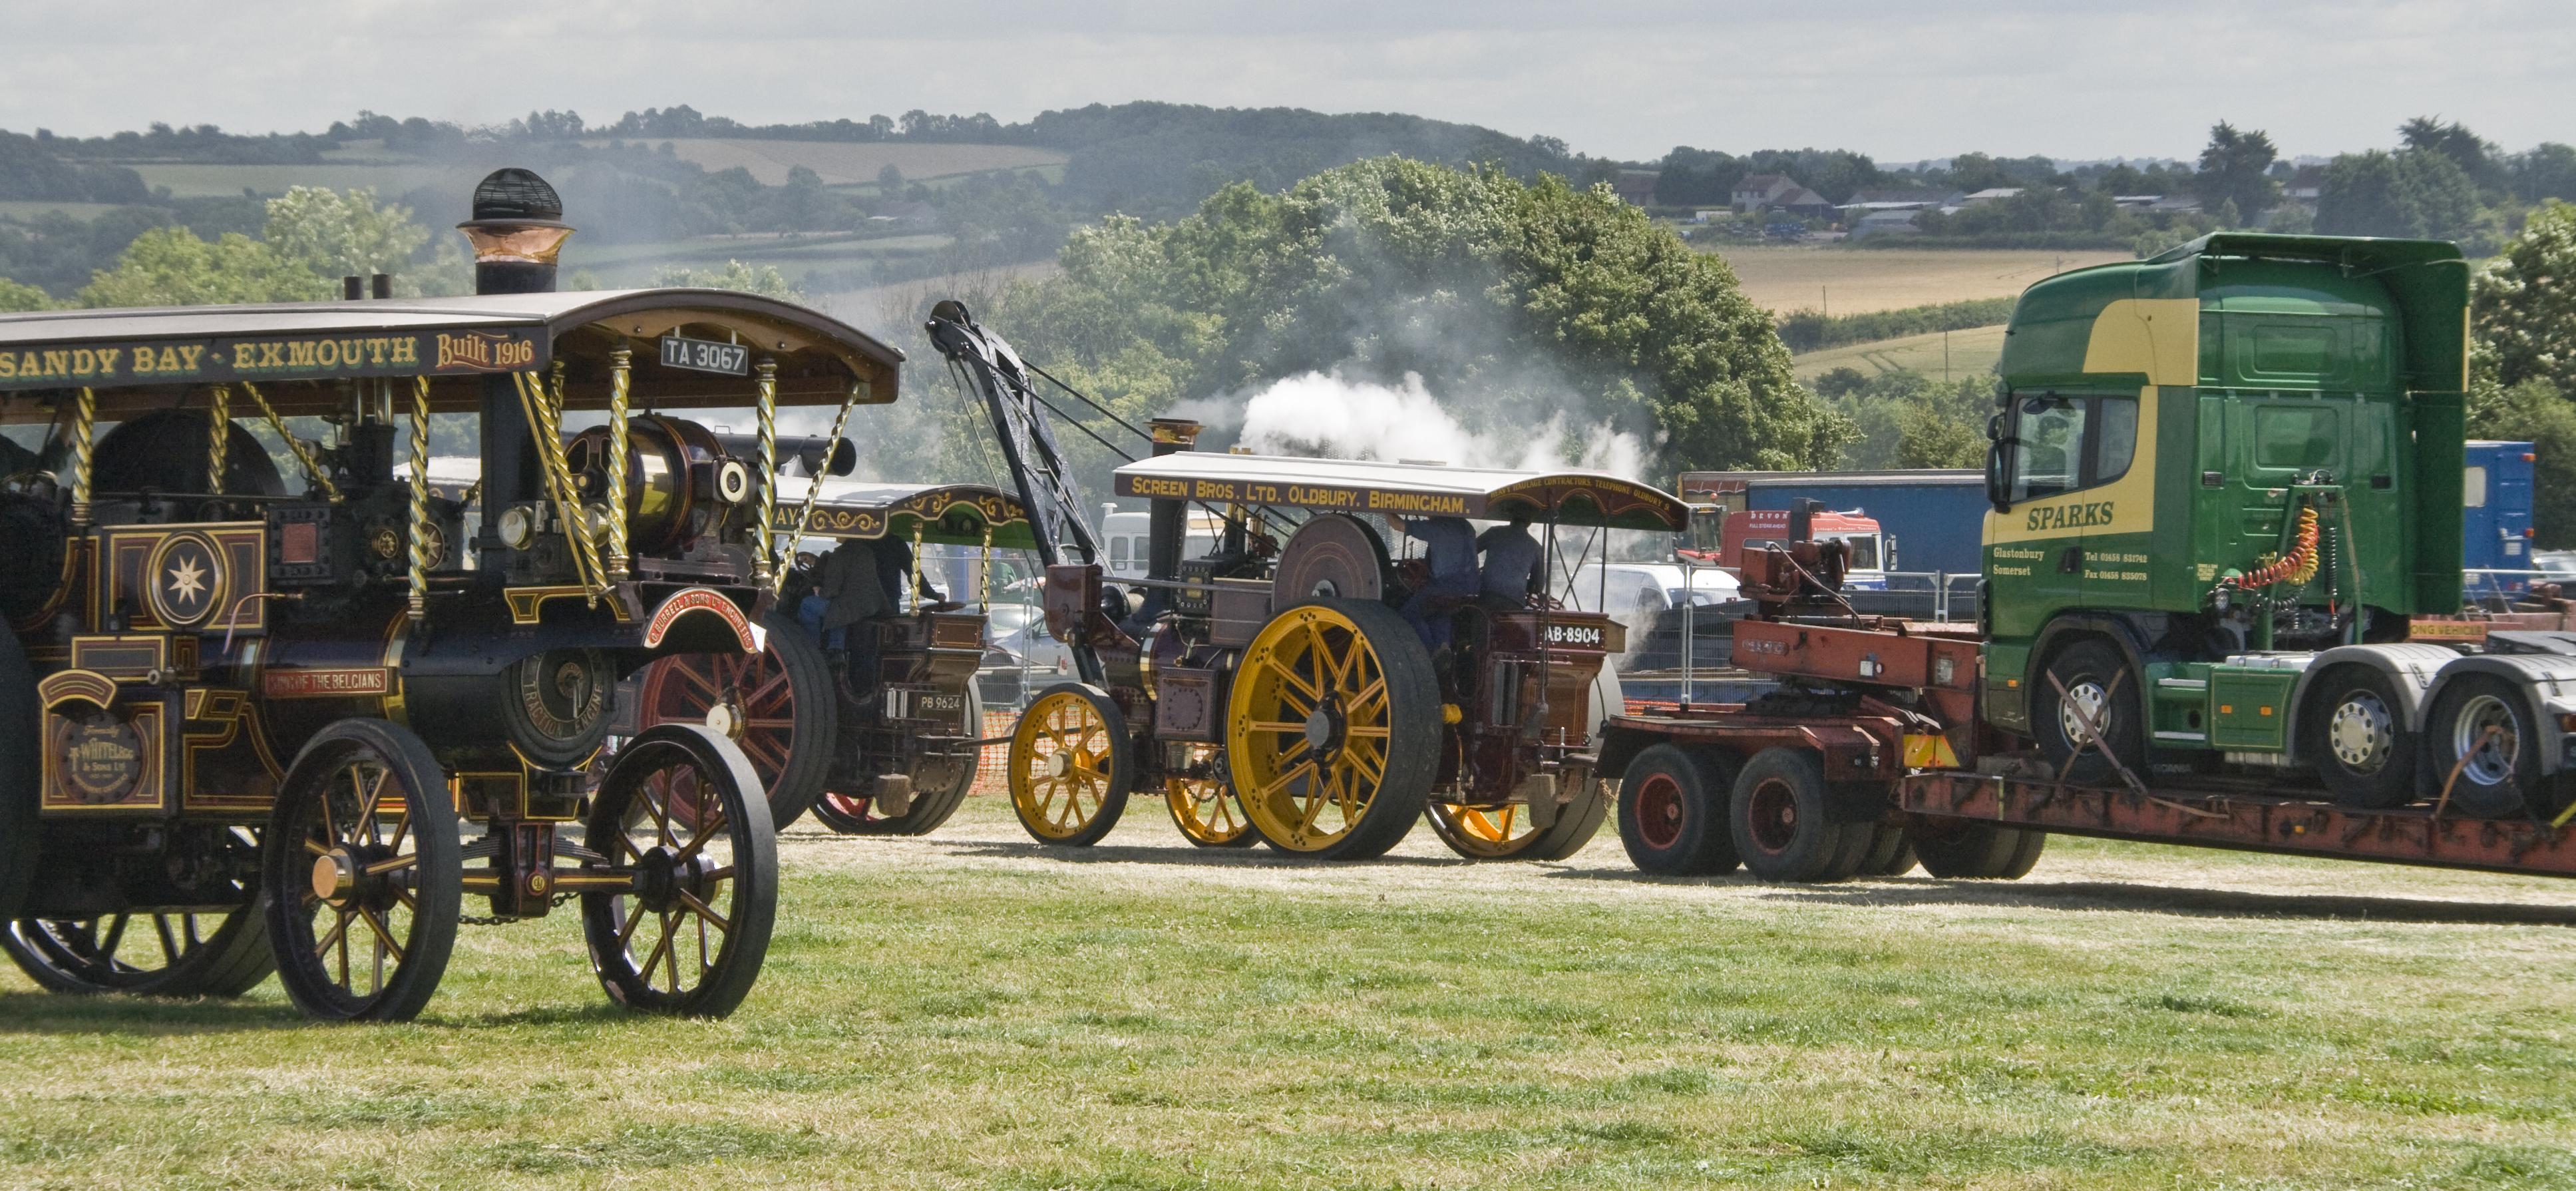 Steam engine rally